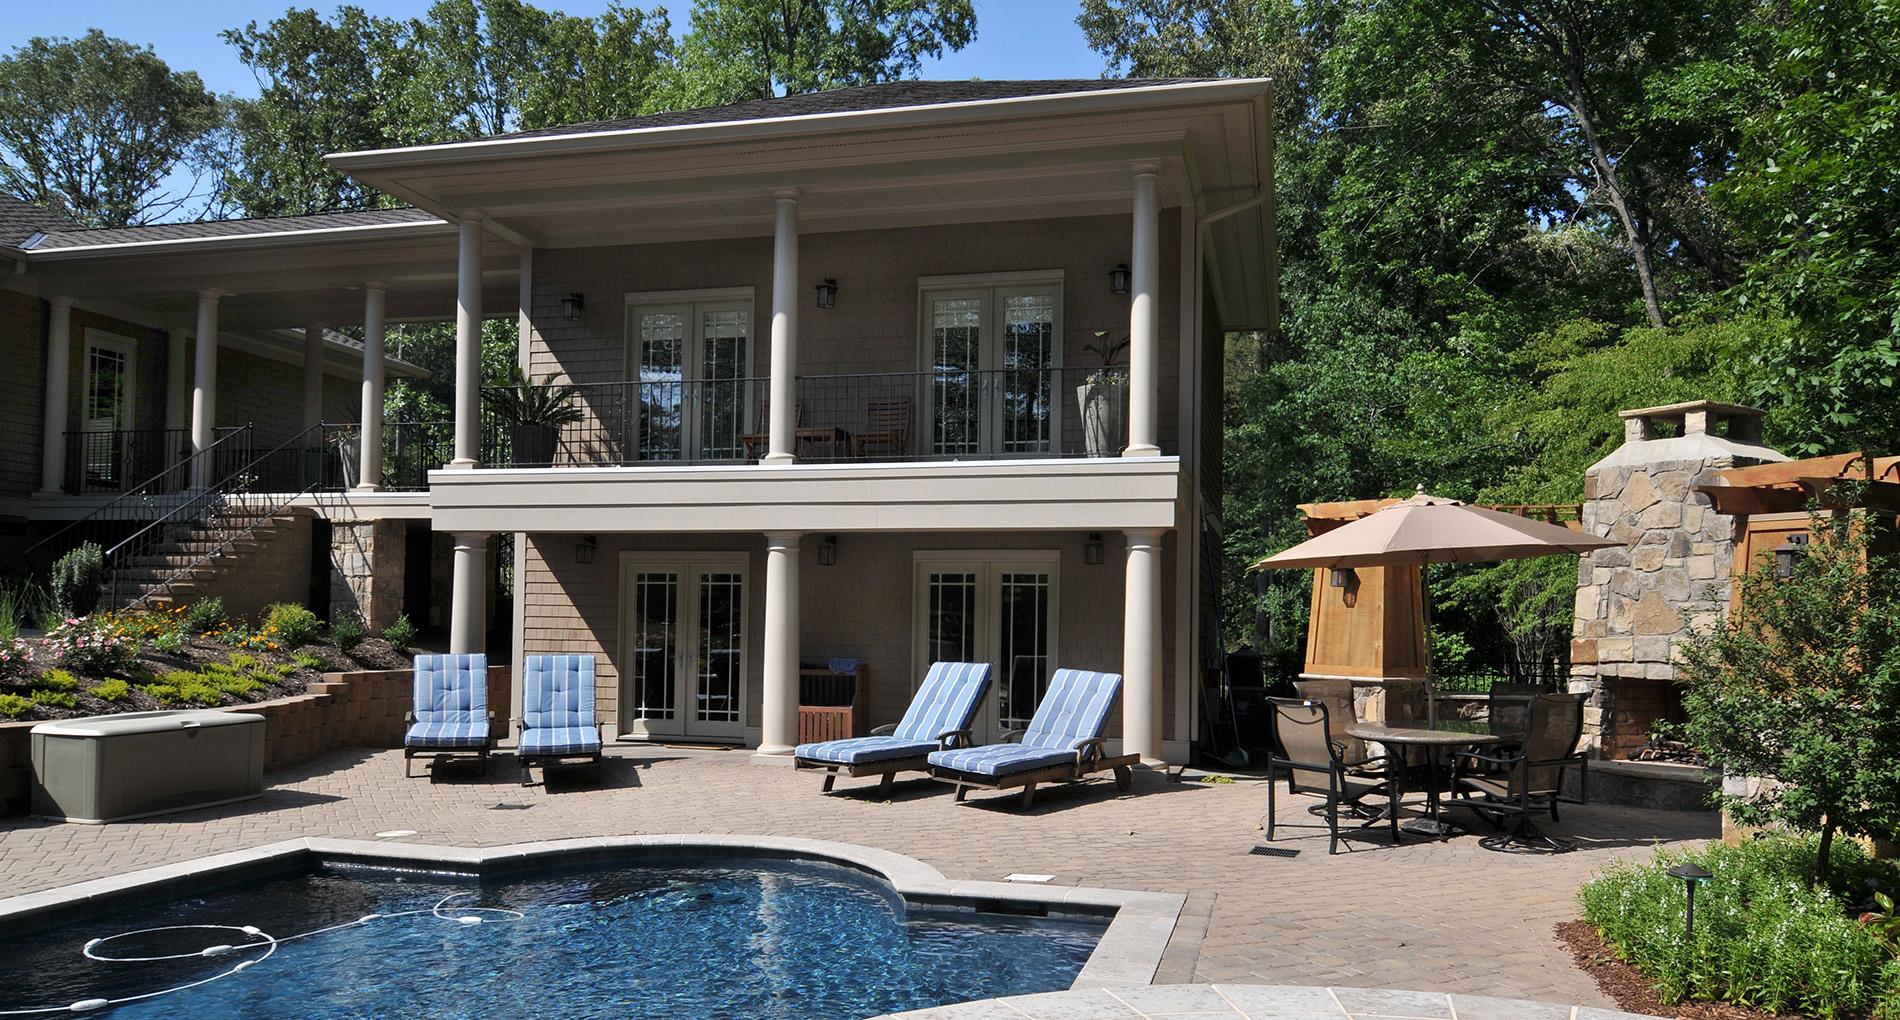 Weddington Pool House